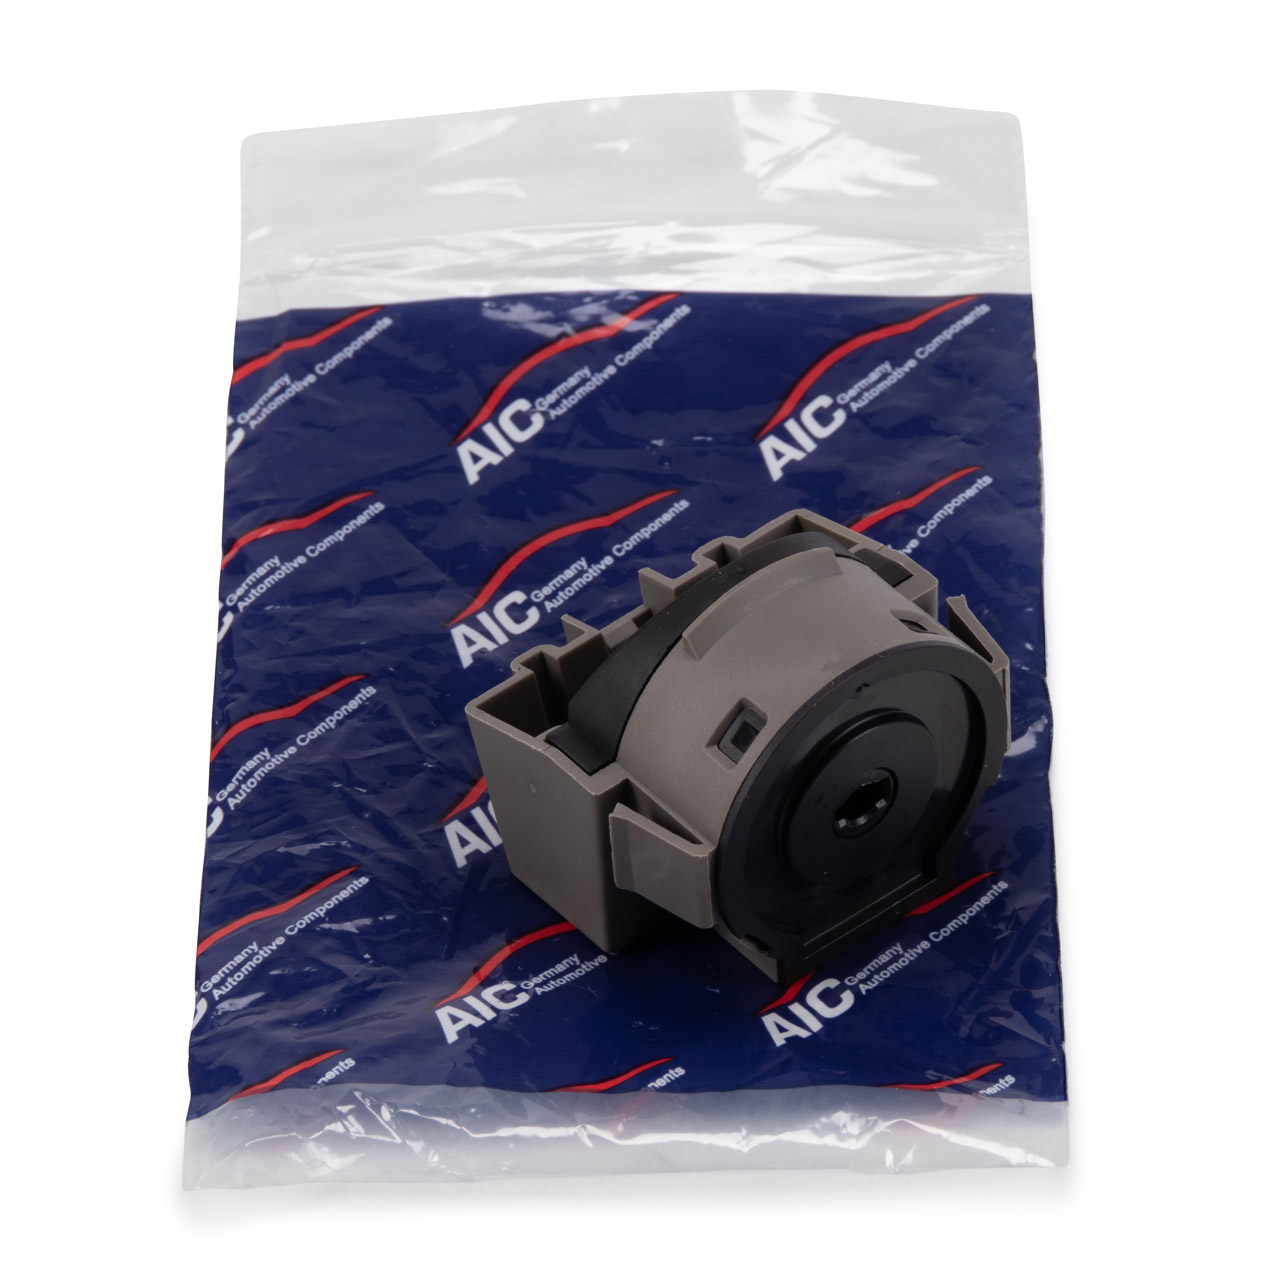 AIC Zündschalter für FORD B-MAX C-MAX FIESTA FOCUS FUSION GALAXY MONDEO S-MAX